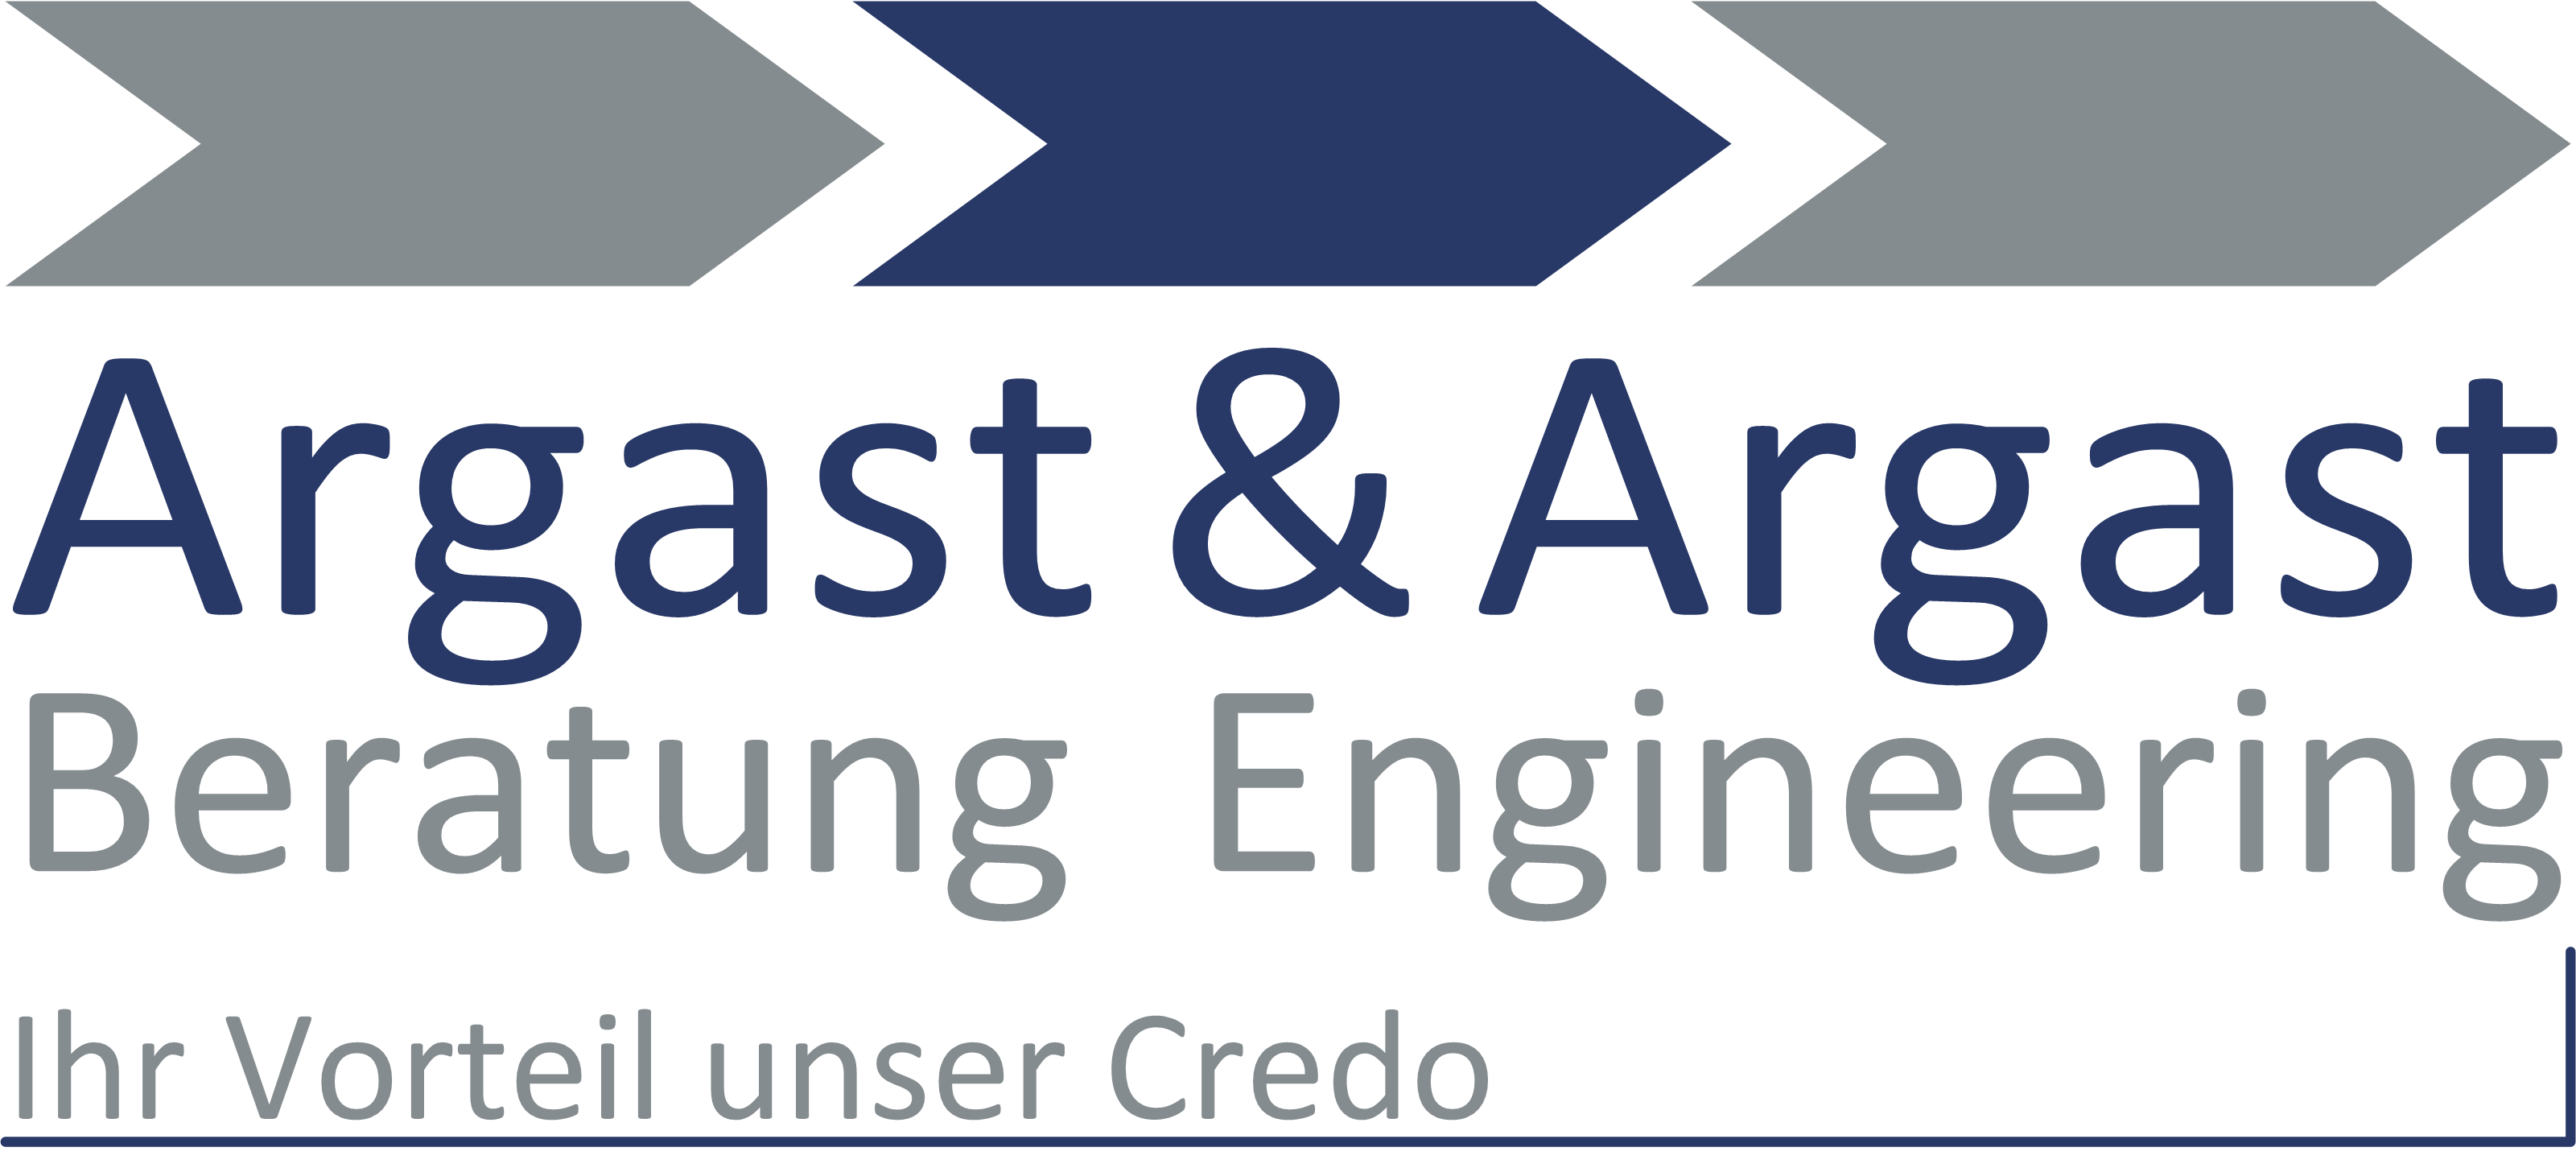 Argast & Argast Beratung Engineering